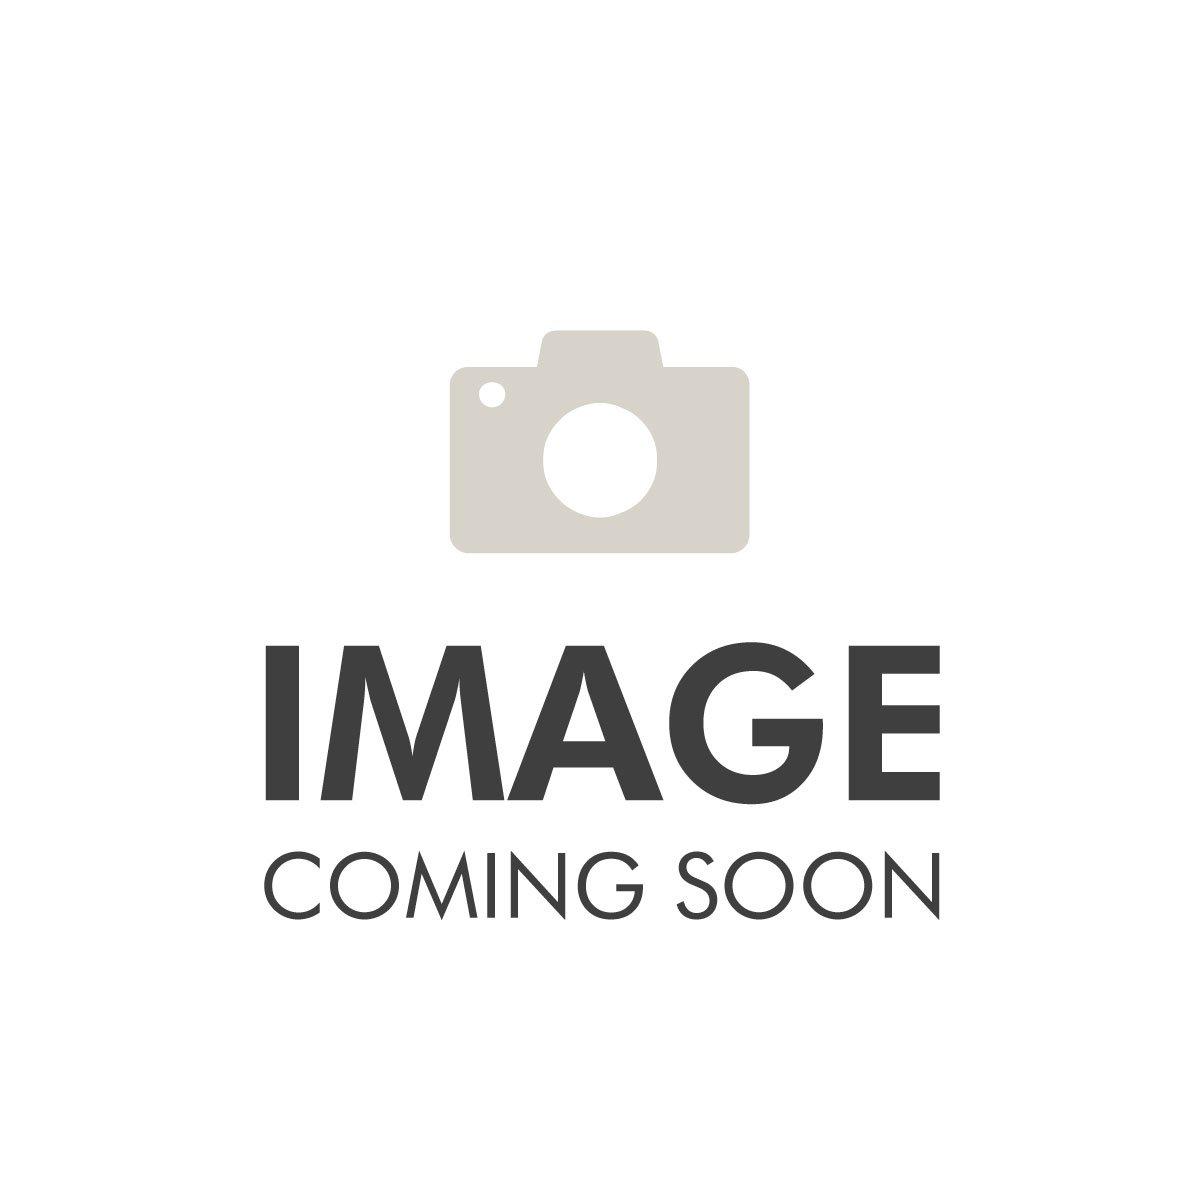 L'Oreal Loreal Accord Parfait Highlight Fluide 301 Rose Glacé